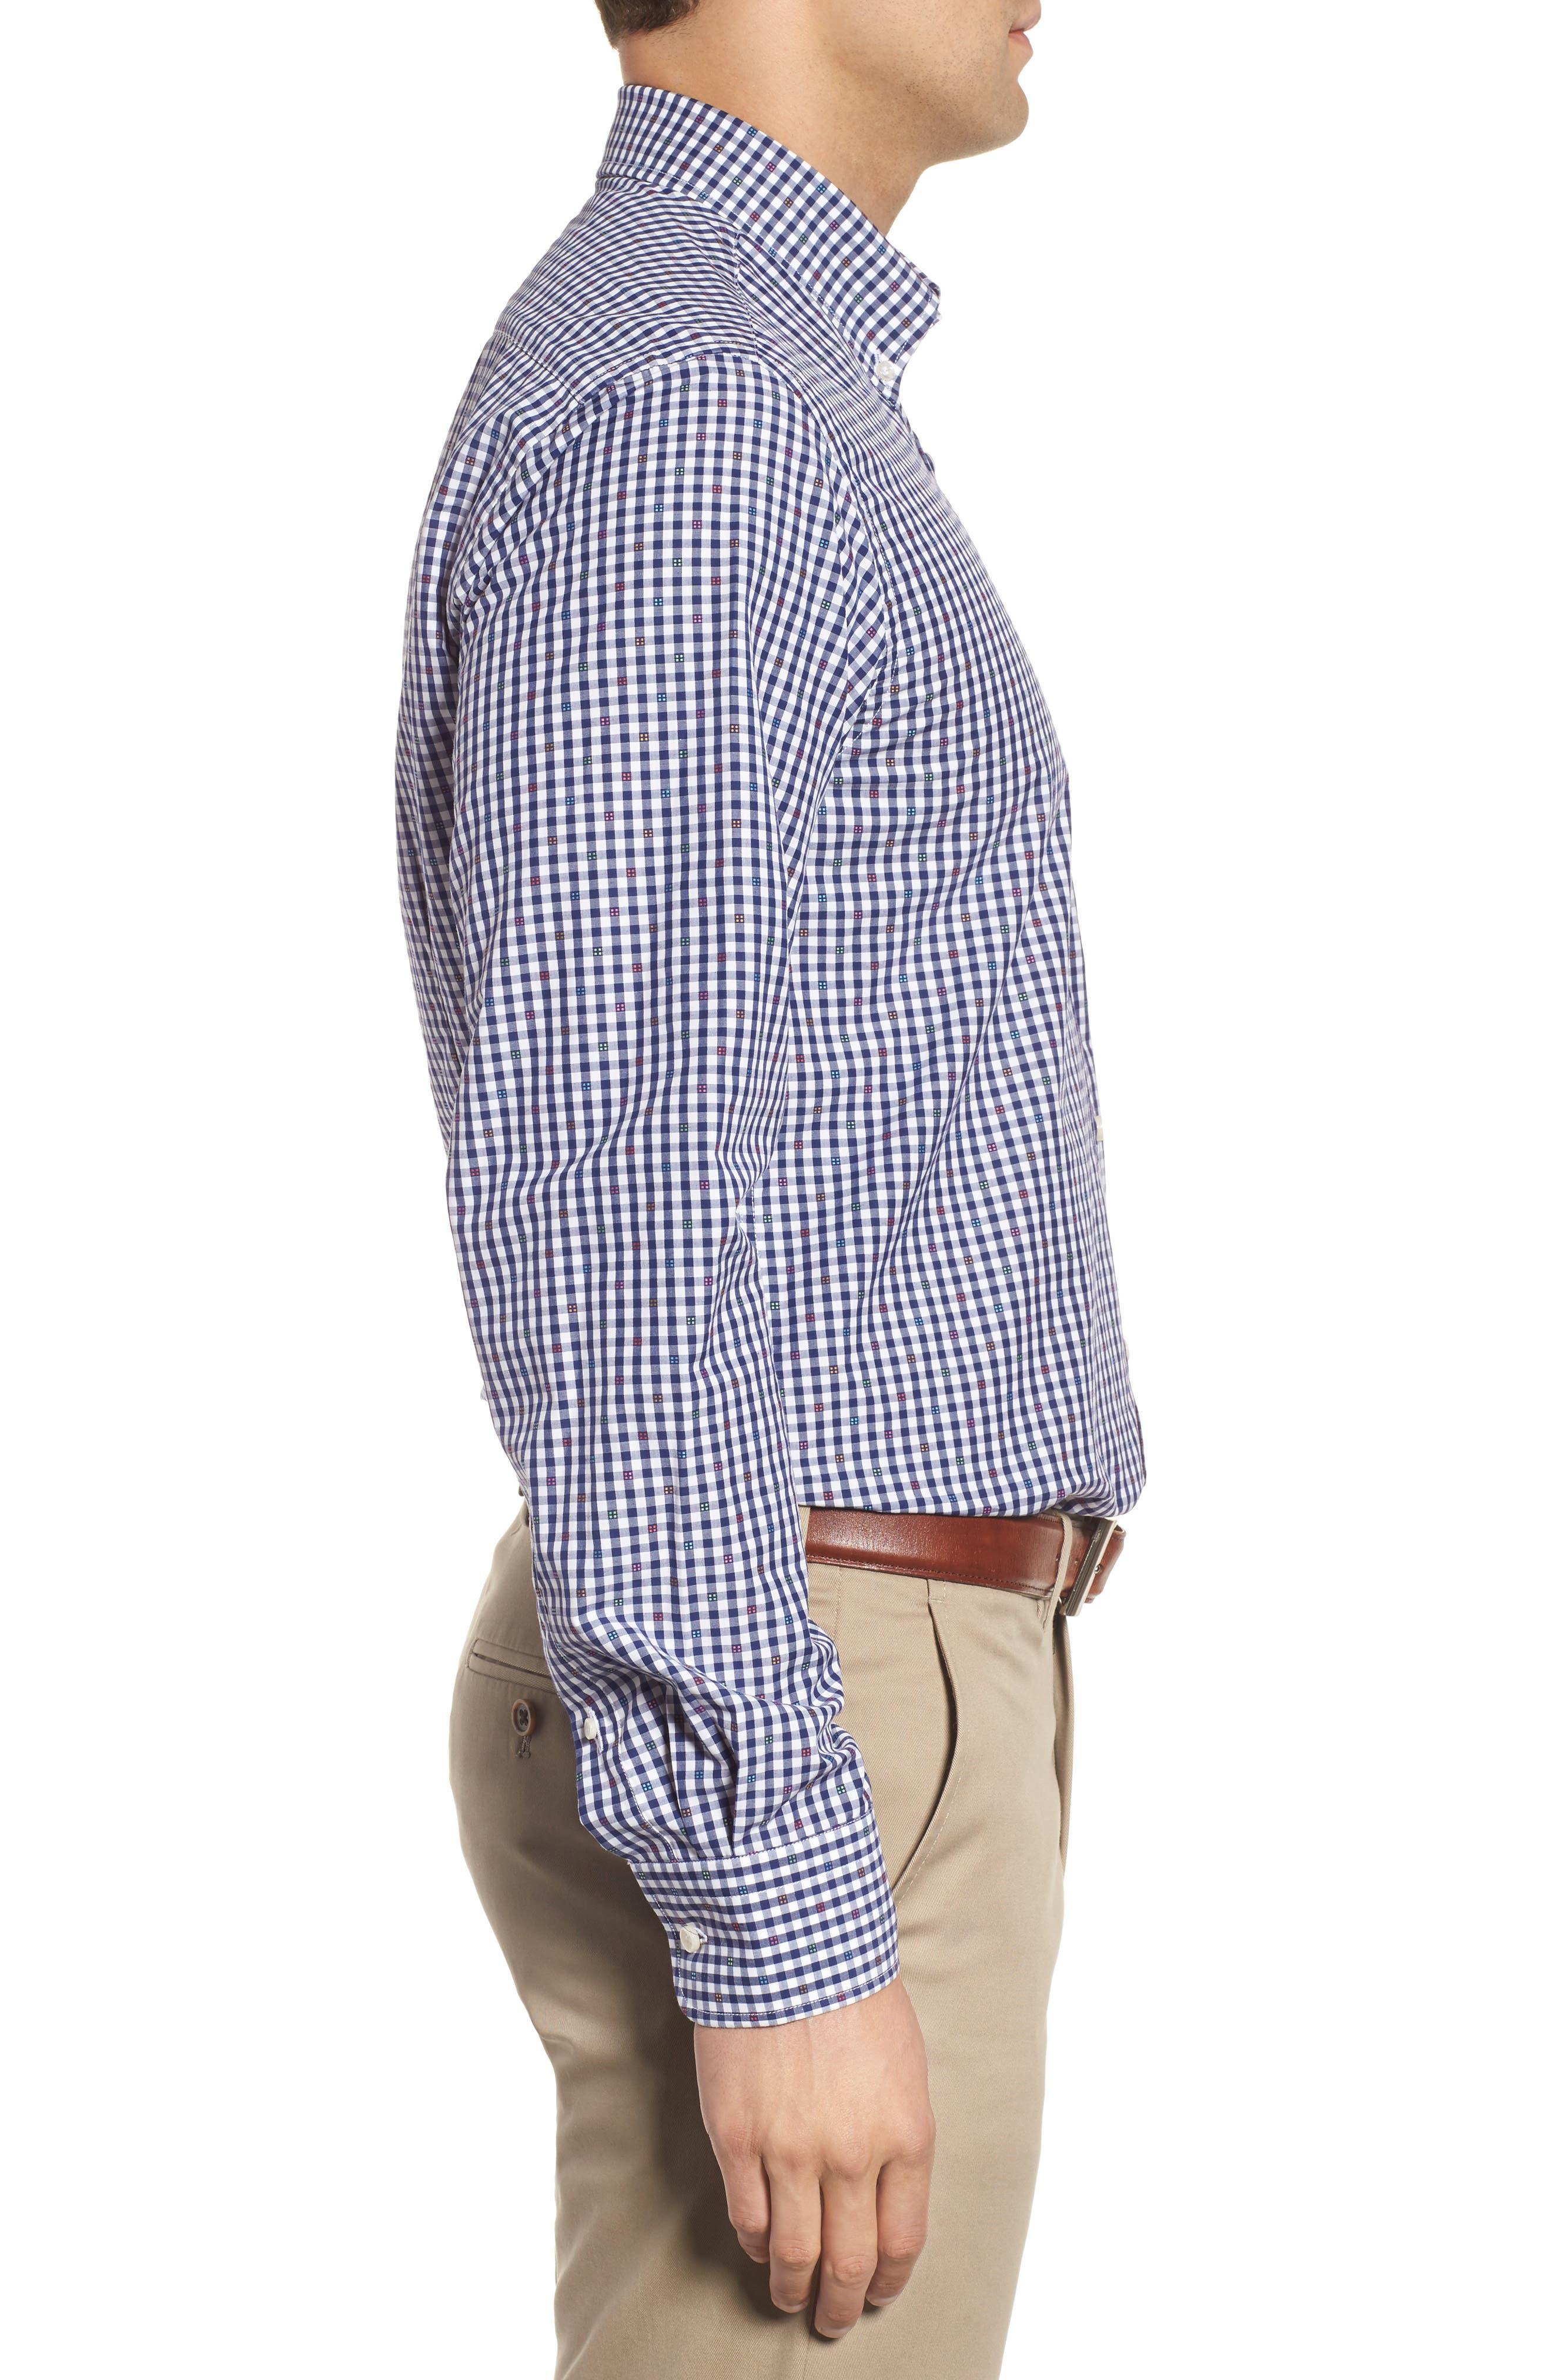 Paul&Shark Regular Fit Jacquard Check Sport Shirt,                             Alternate thumbnail 4, color,                             Navy/ White